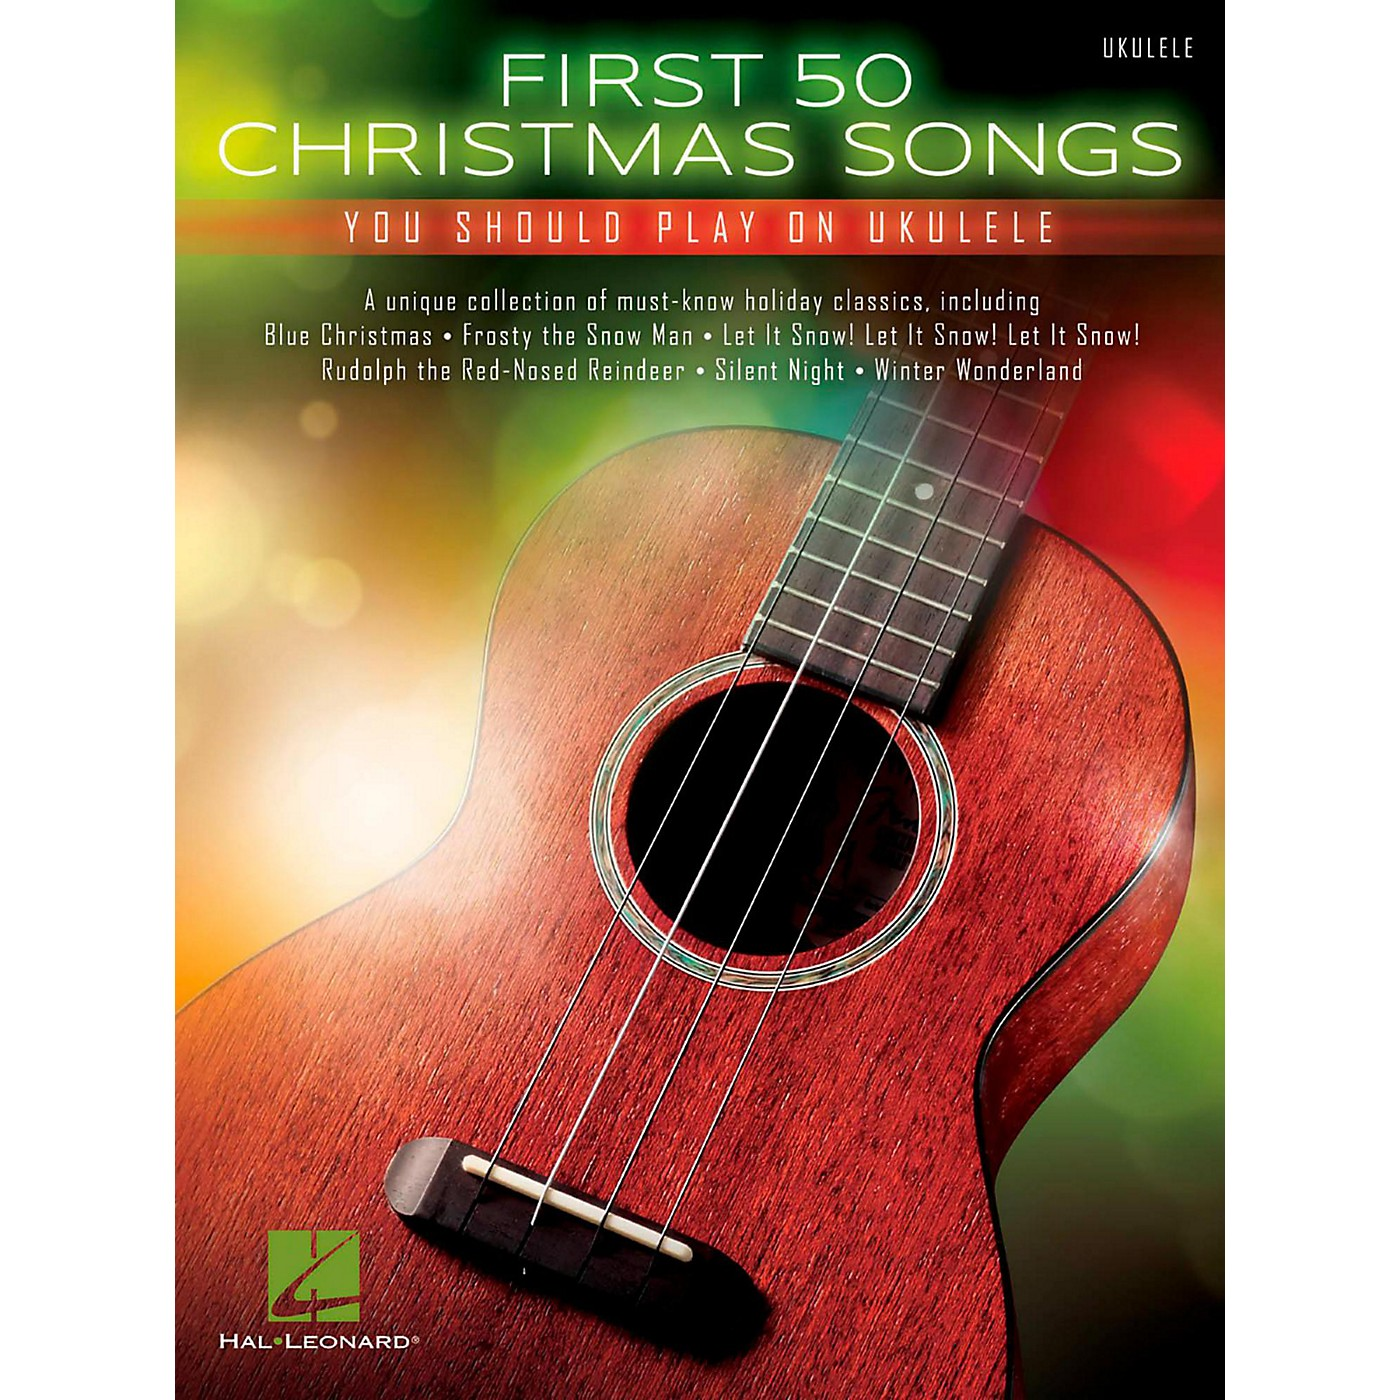 Hal Leonard First 50 Christmas Songs You Should Play on Ukulele thumbnail